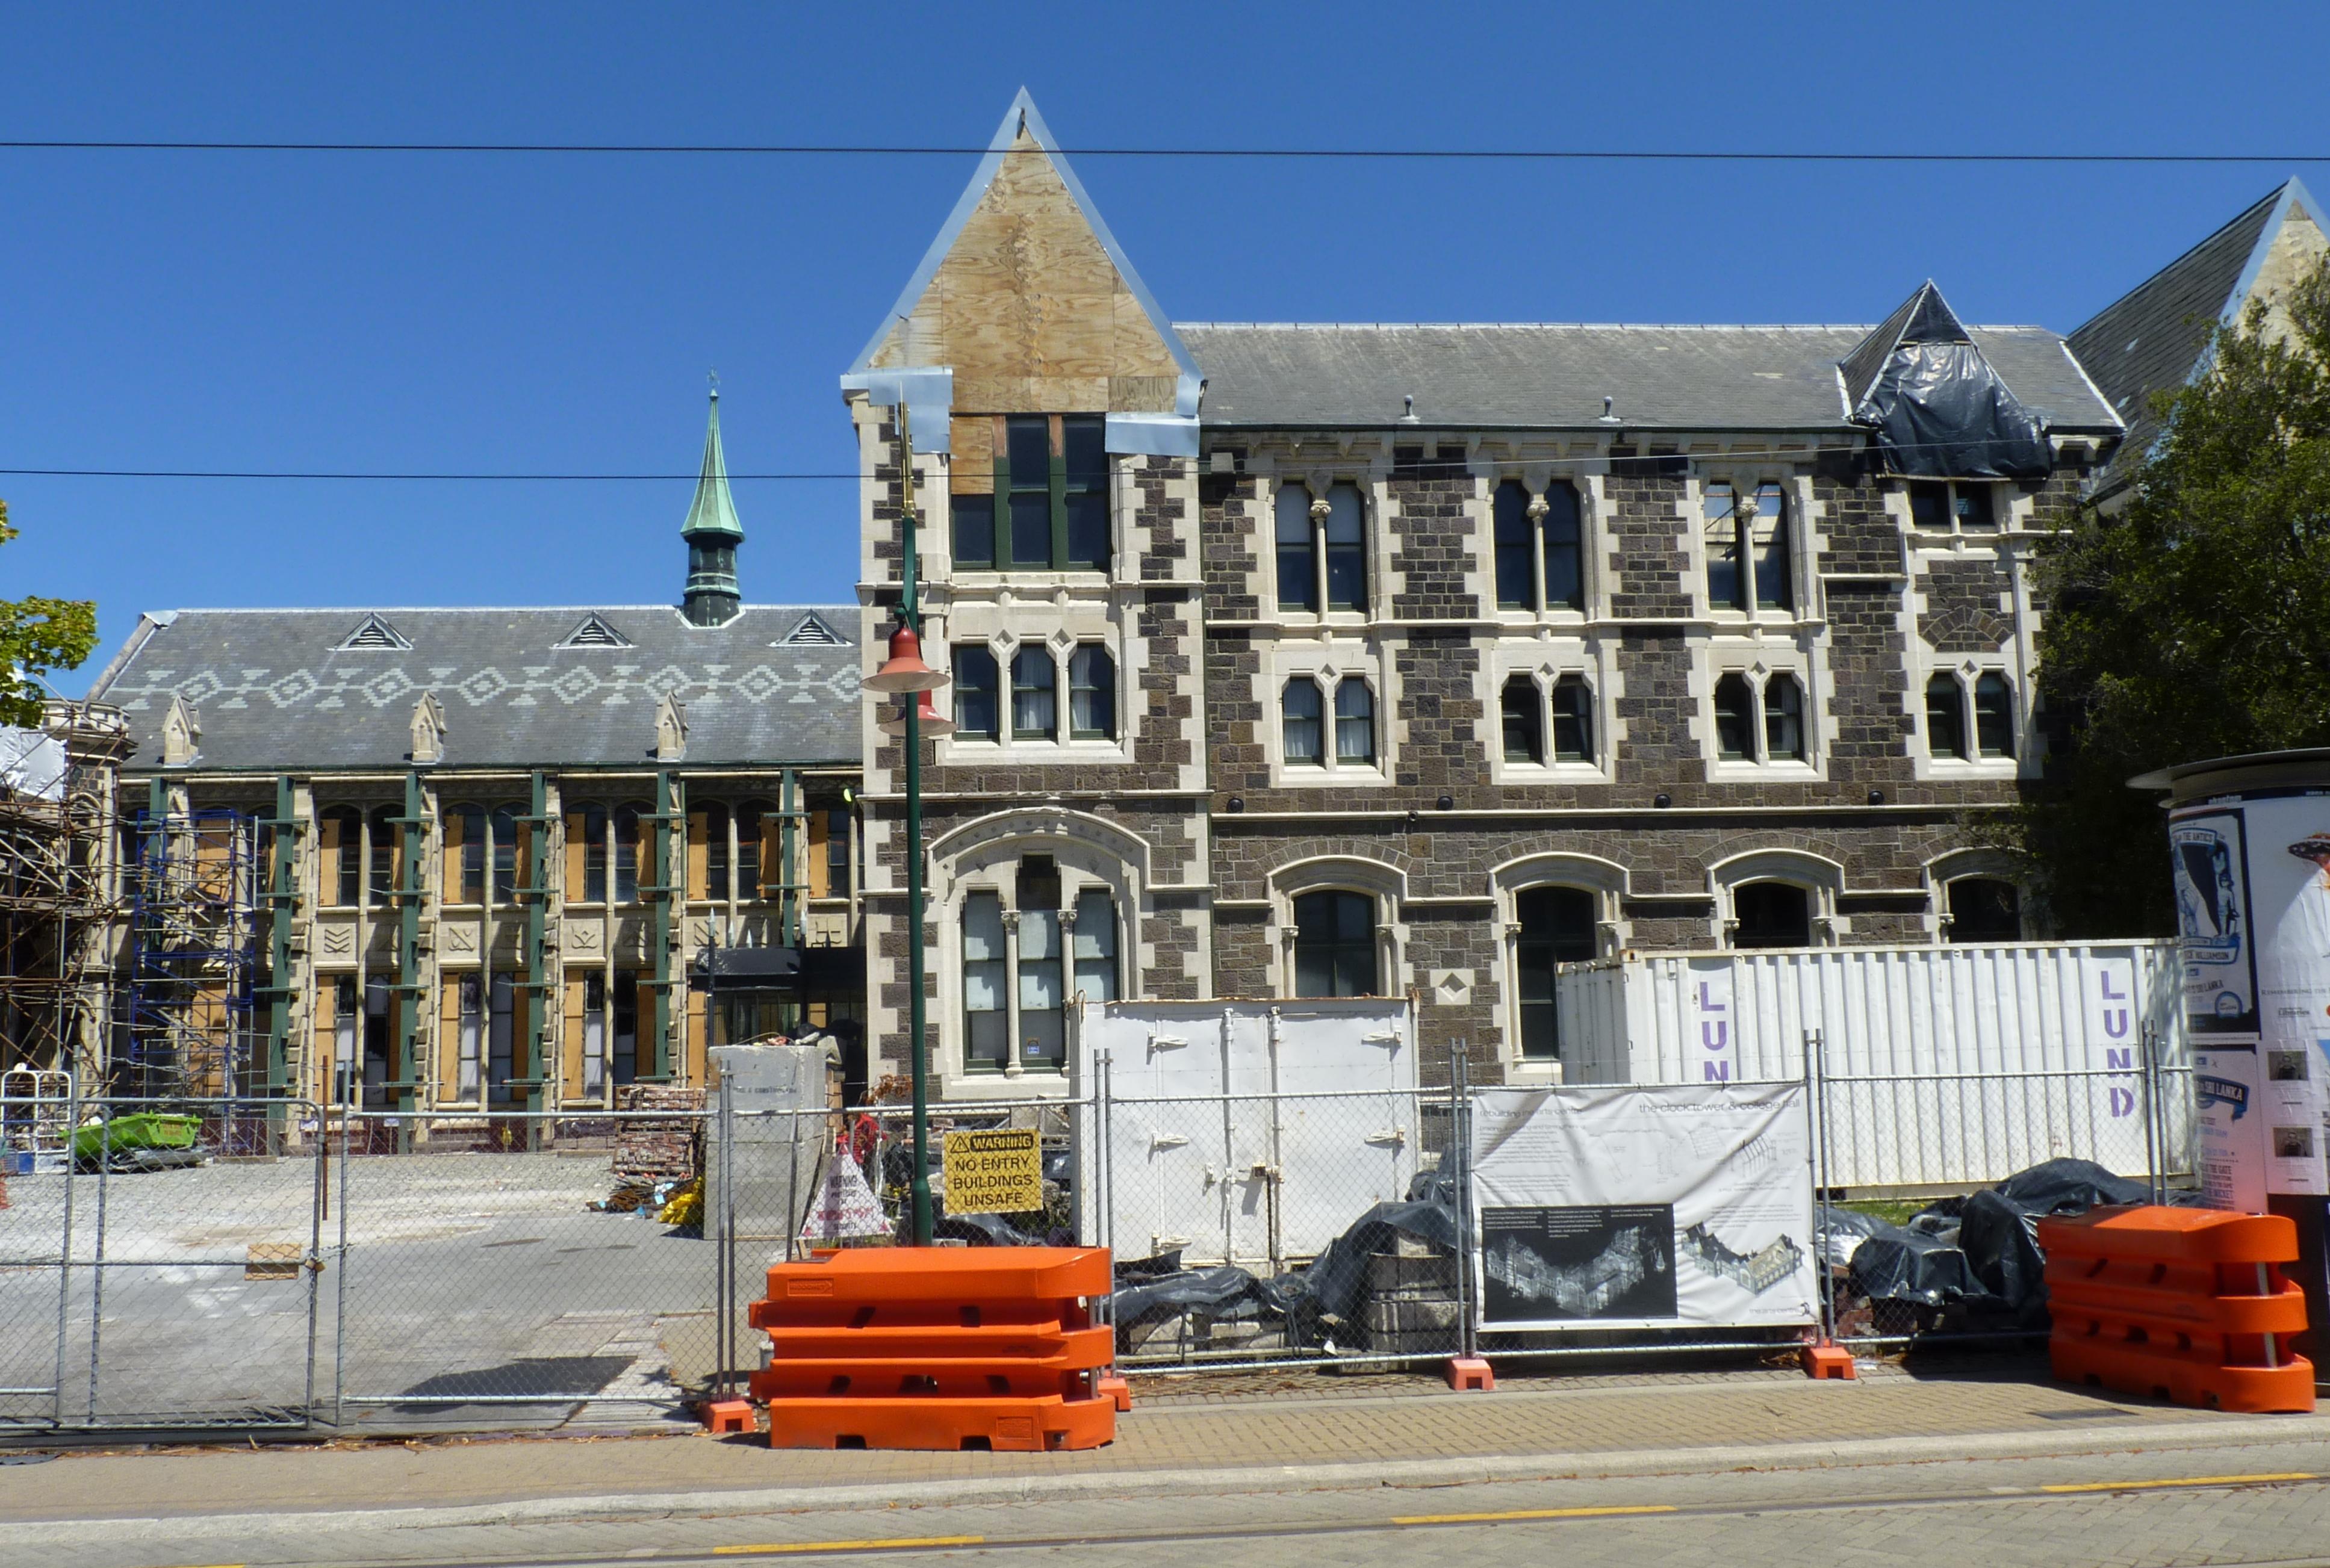 Christchurch Wikipedia: File:Christchurch, City Centre, New Zealand (5).JPG